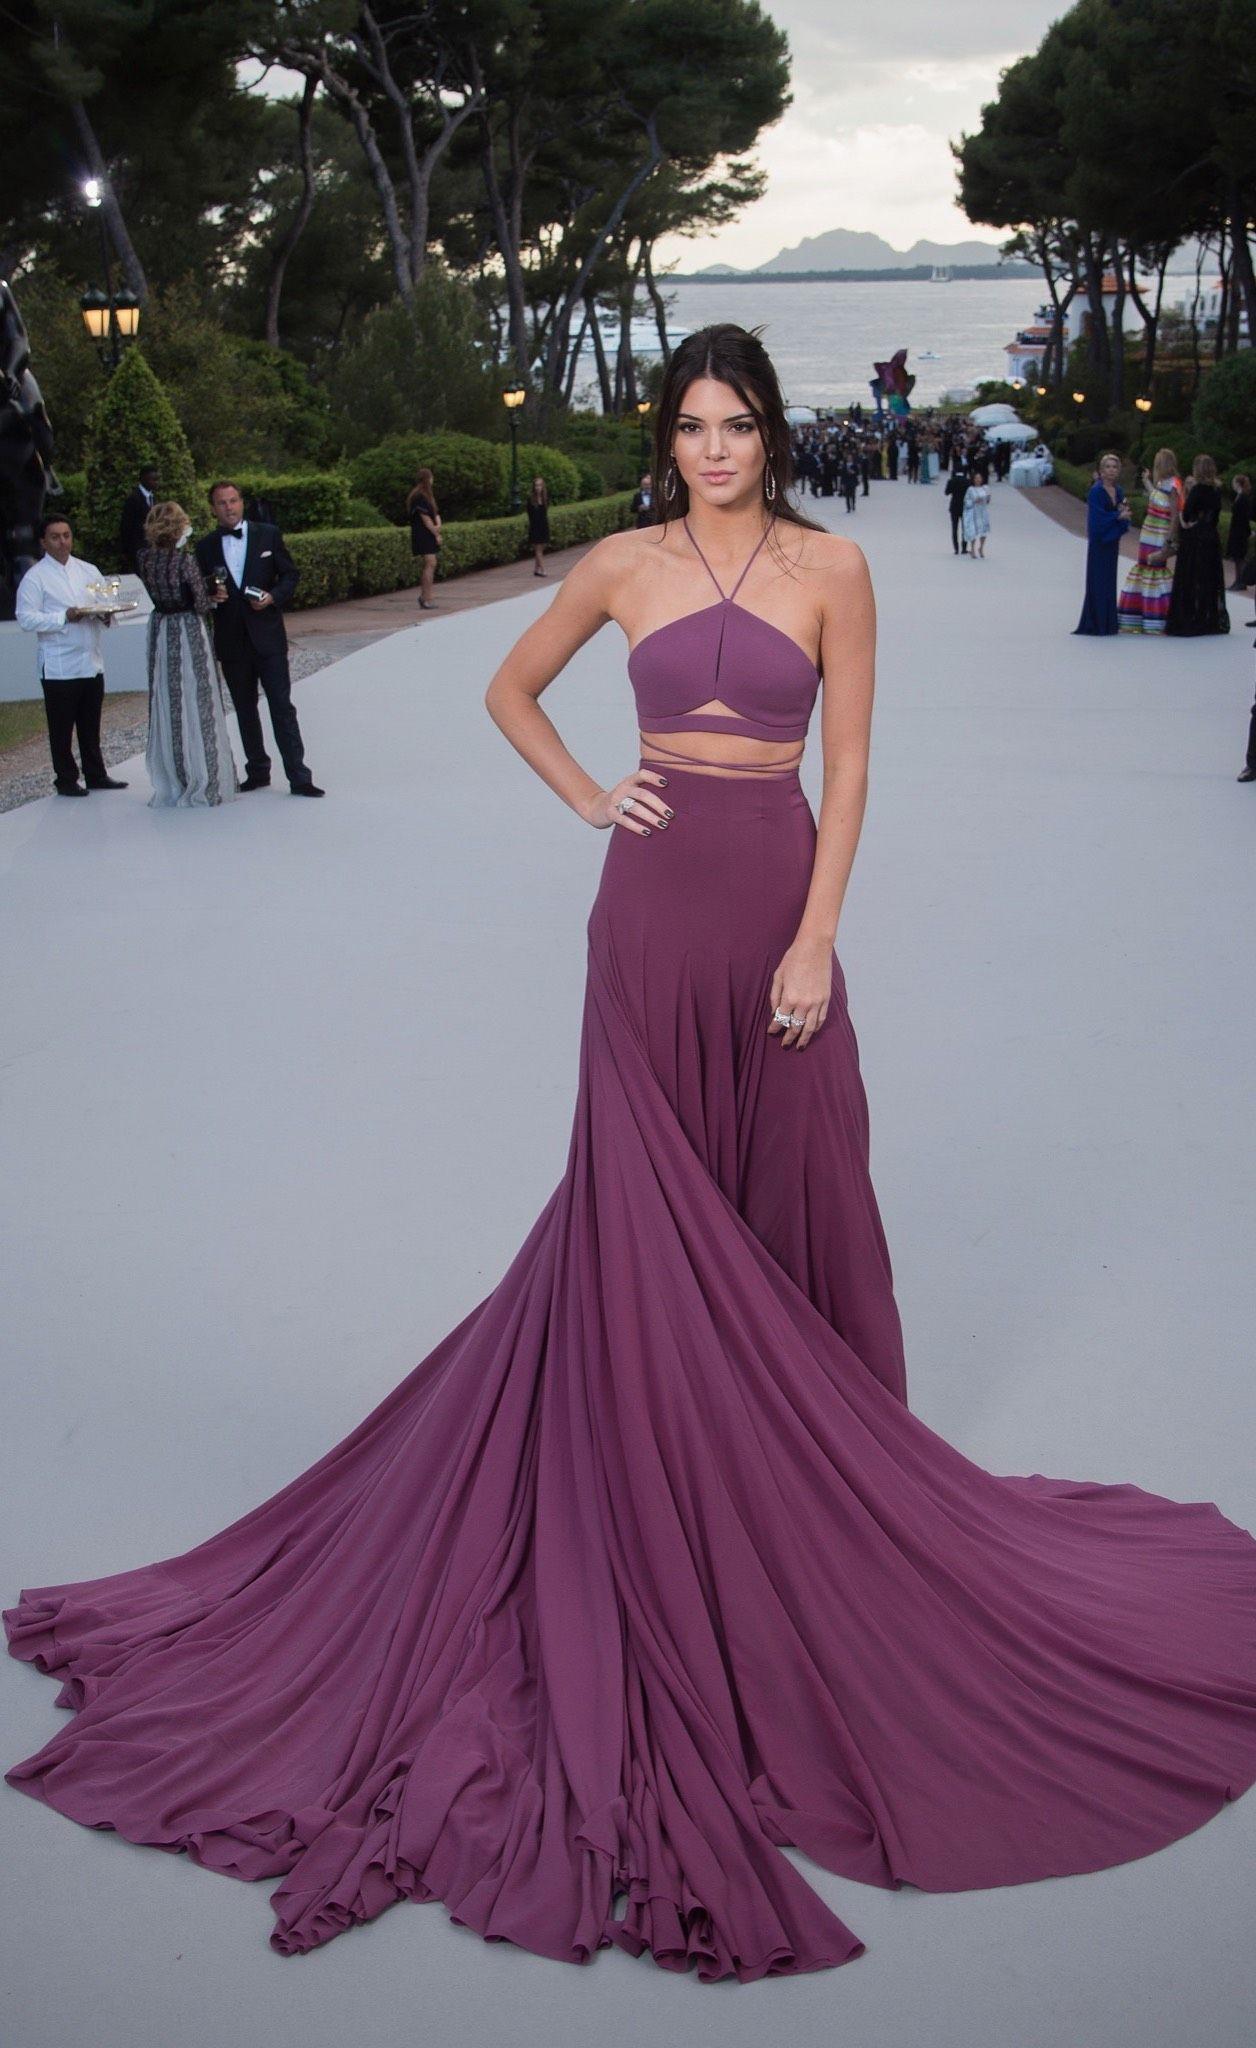 Best Of Cannes Red Carpet Part II | Vestiditos, Vestidos alfombra ...